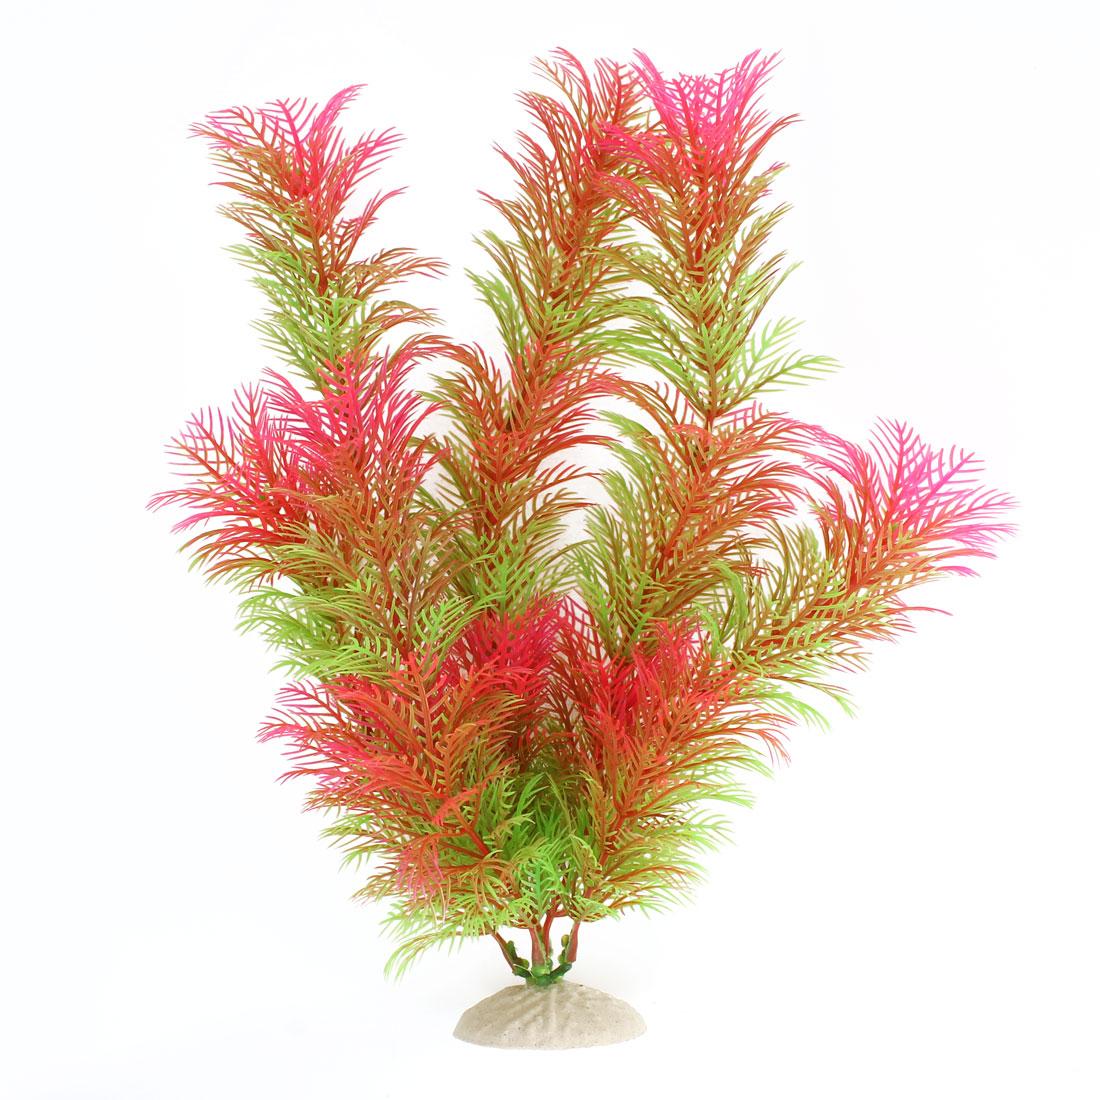 "Green Pink 12.2"" HeightFish Tank Plastic Simulation Aquatic Plant Ornament Decor"